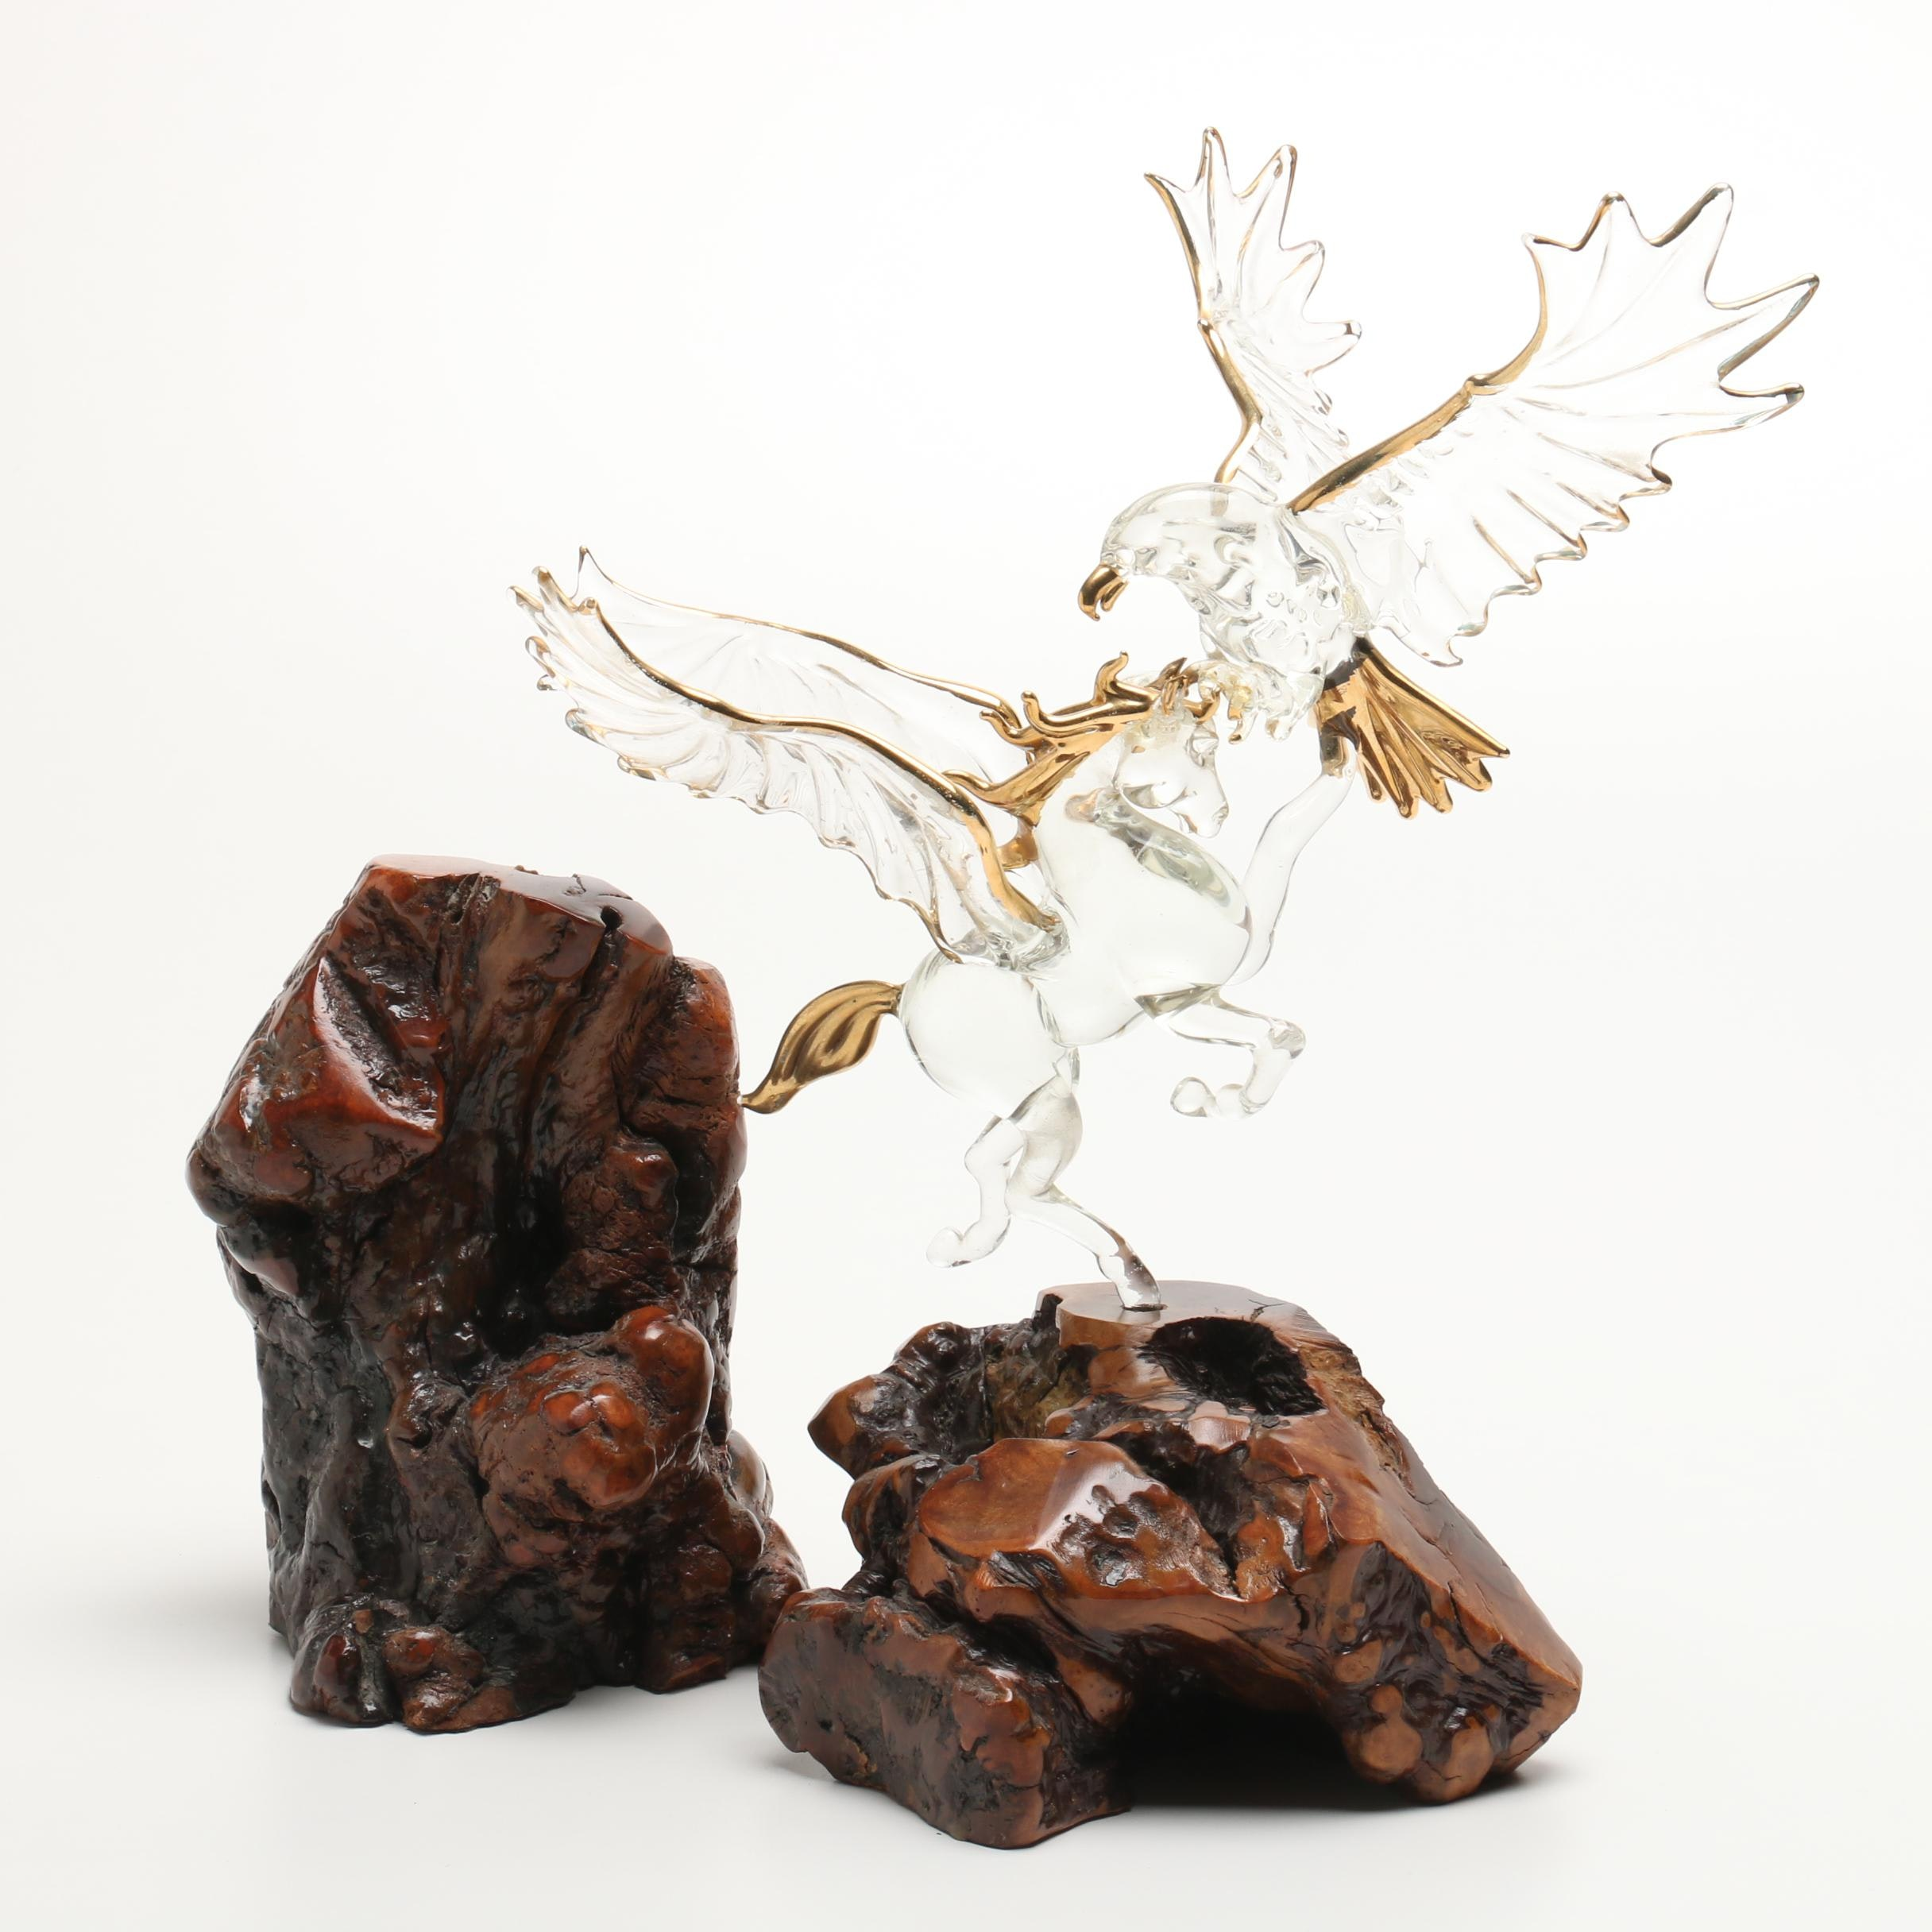 Knotted Burlwood and Glass Decor Figurine